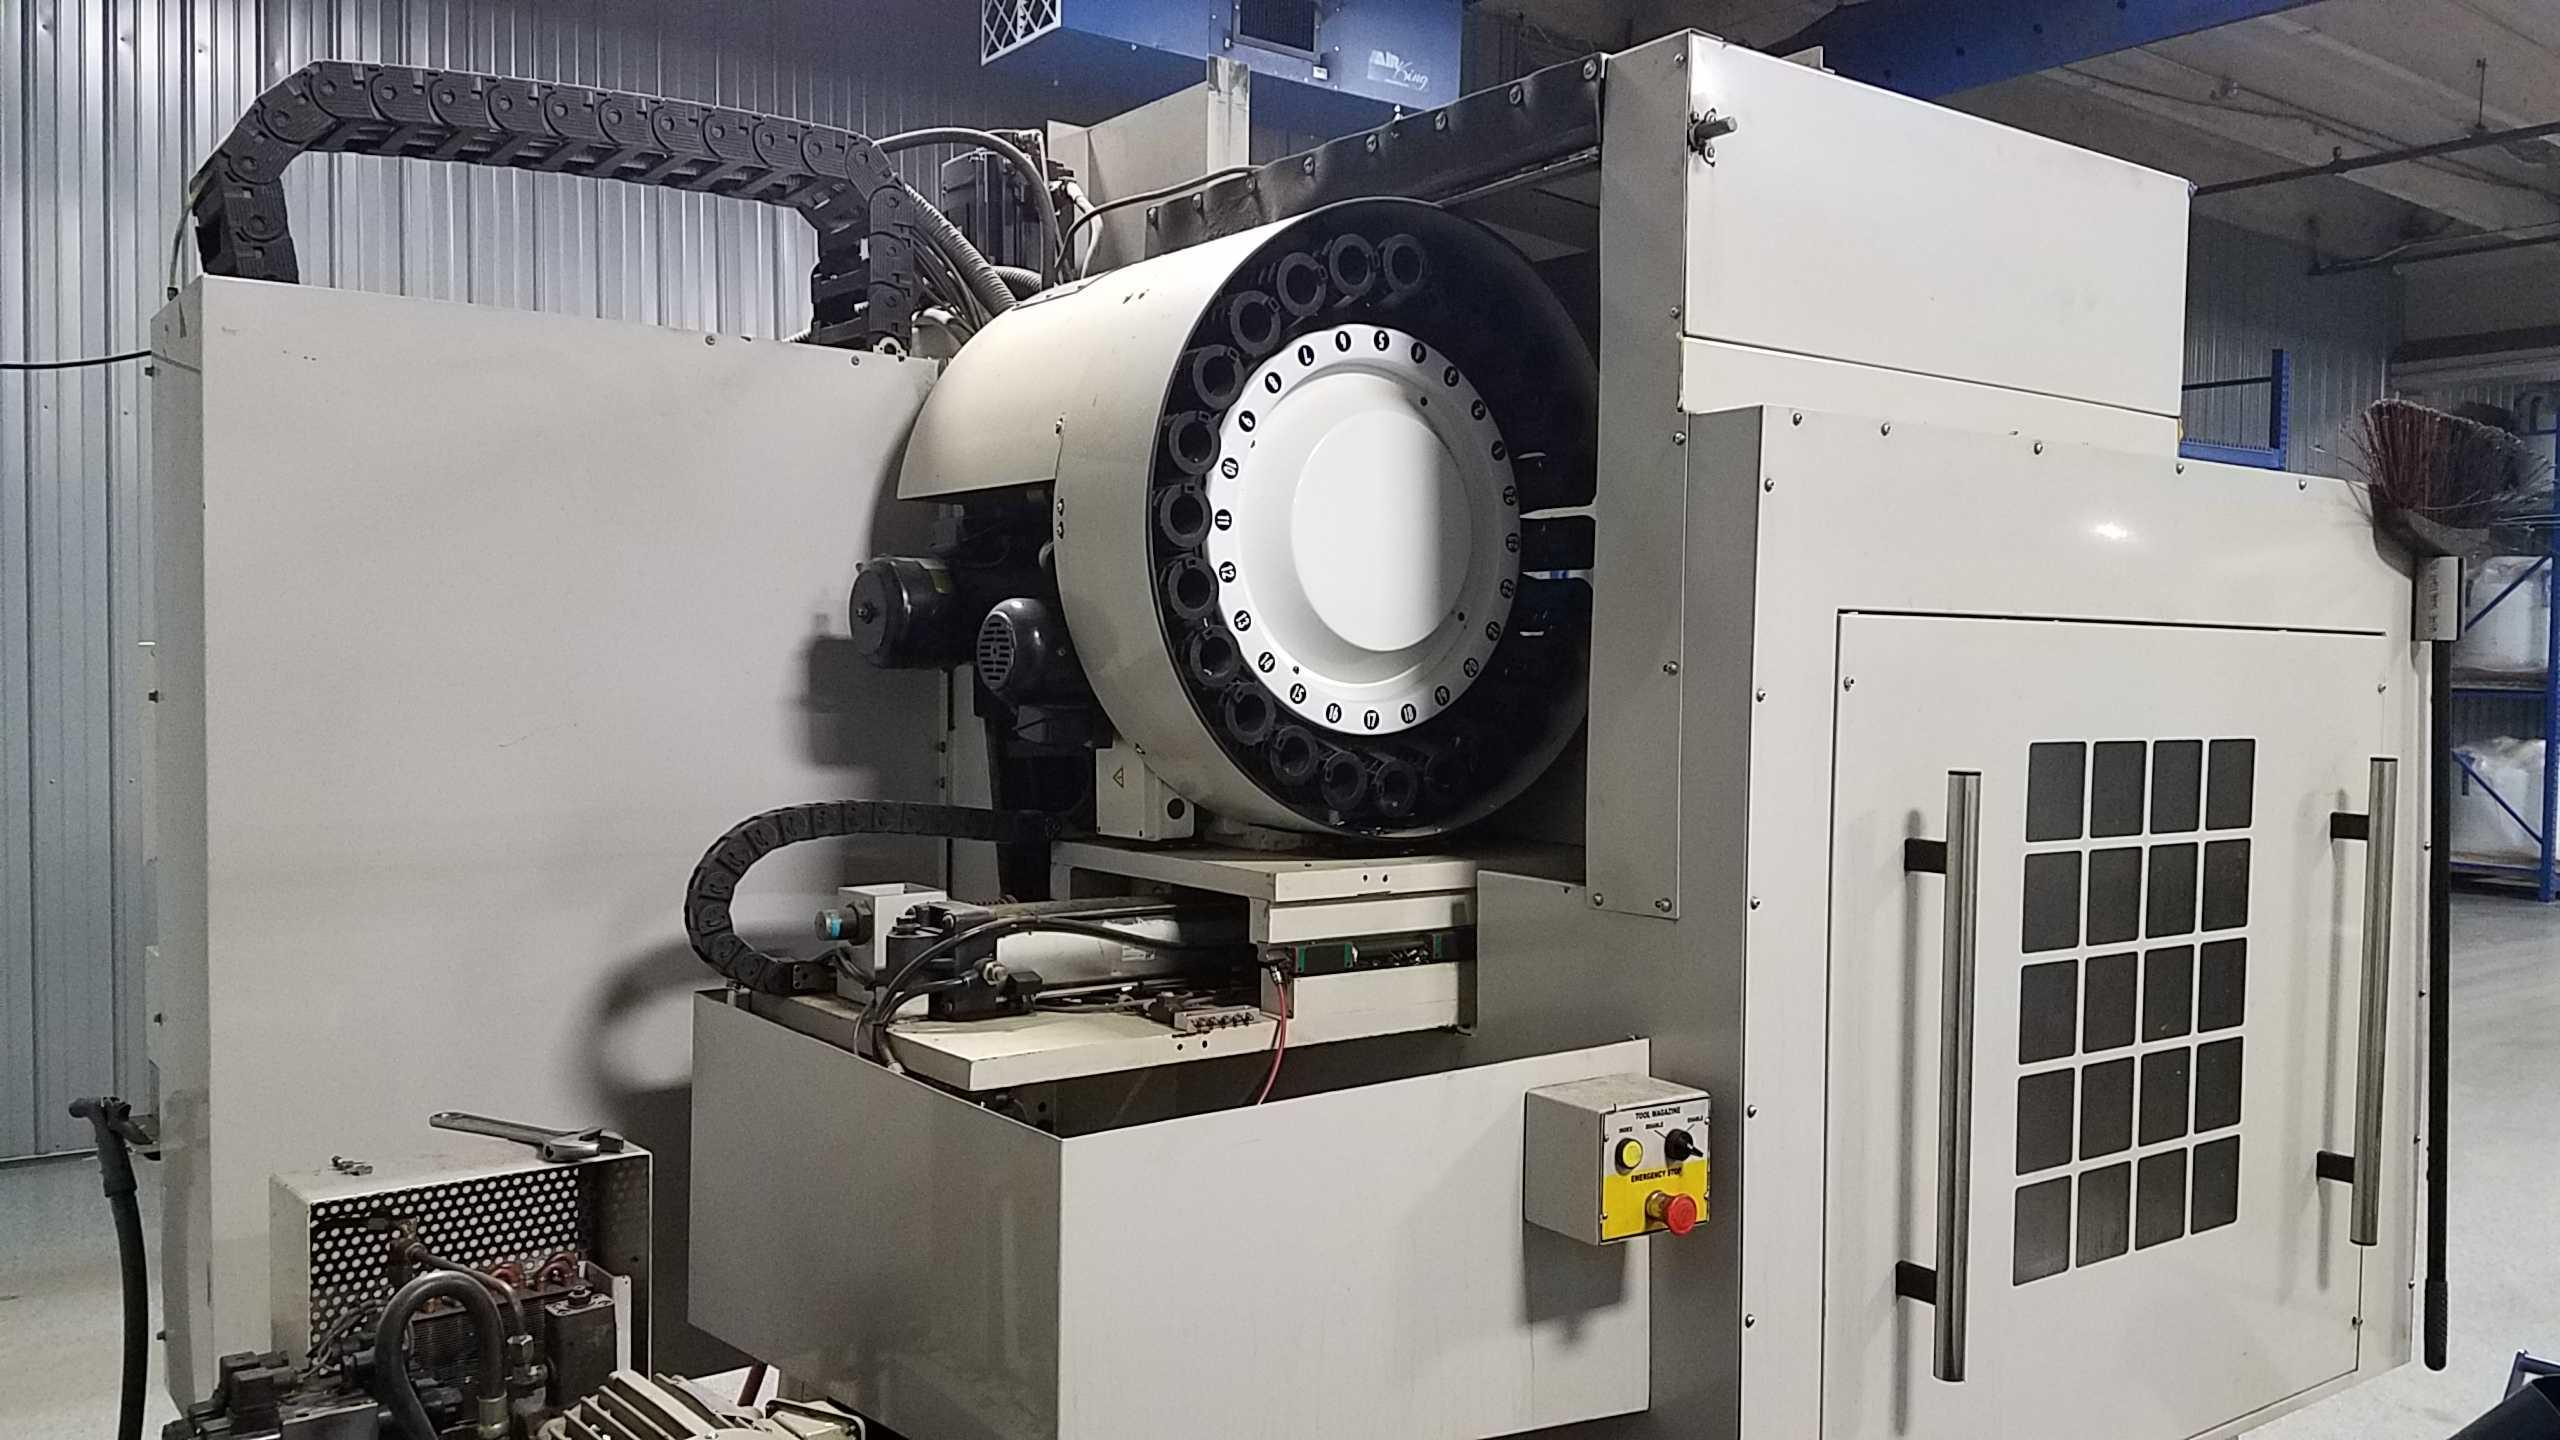 2007 Milltronics HM20 - CNC Horizontal Machining Center